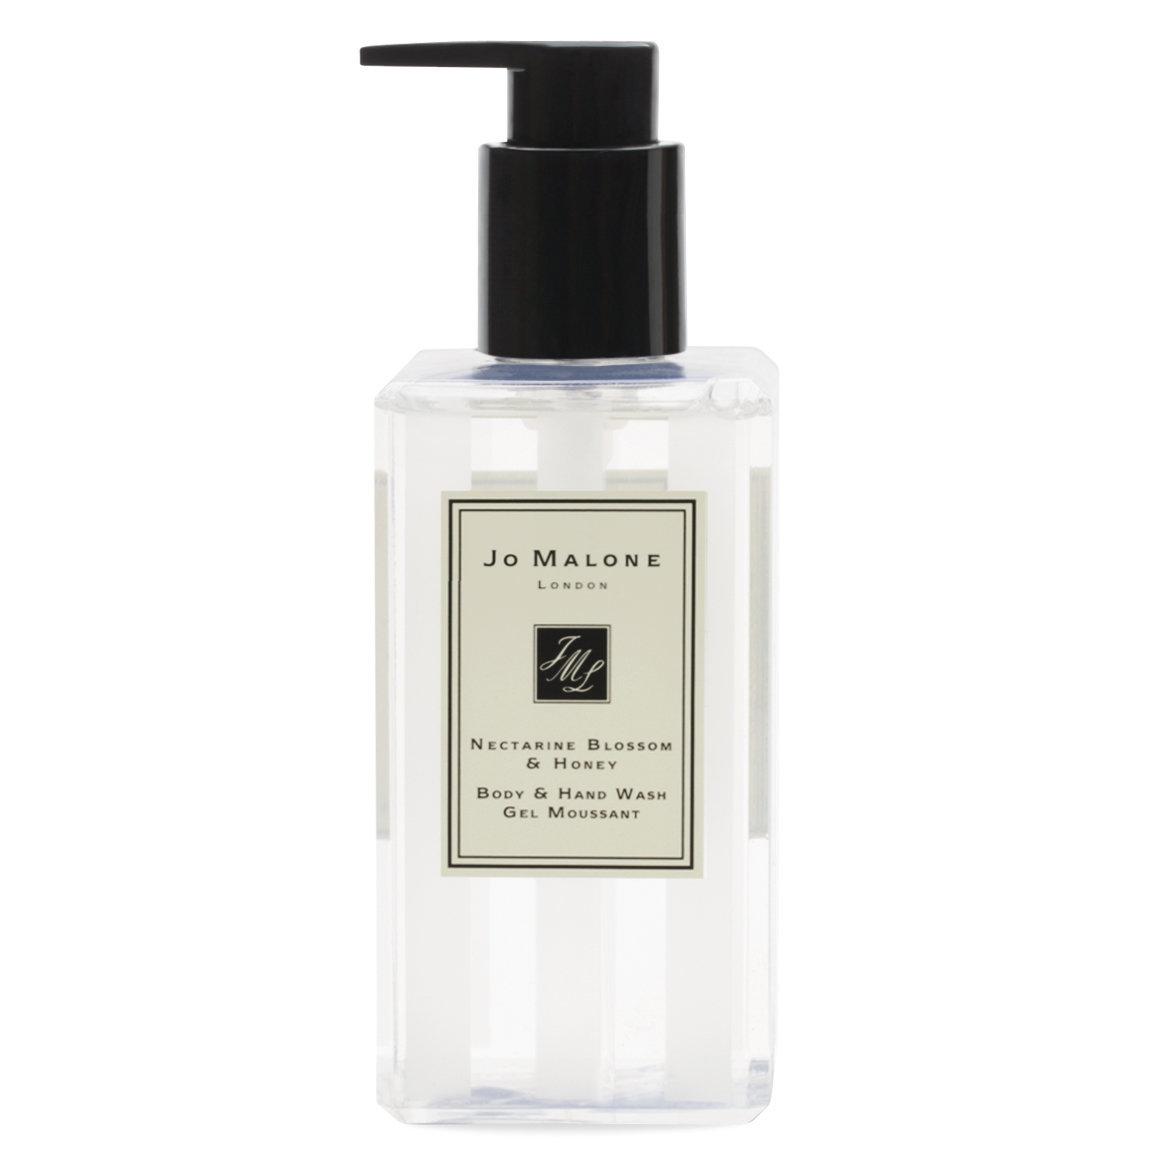 Jo Malone London Nectarine Blossom & Honey Body & Hand Wash alternative view 1 - product swatch.